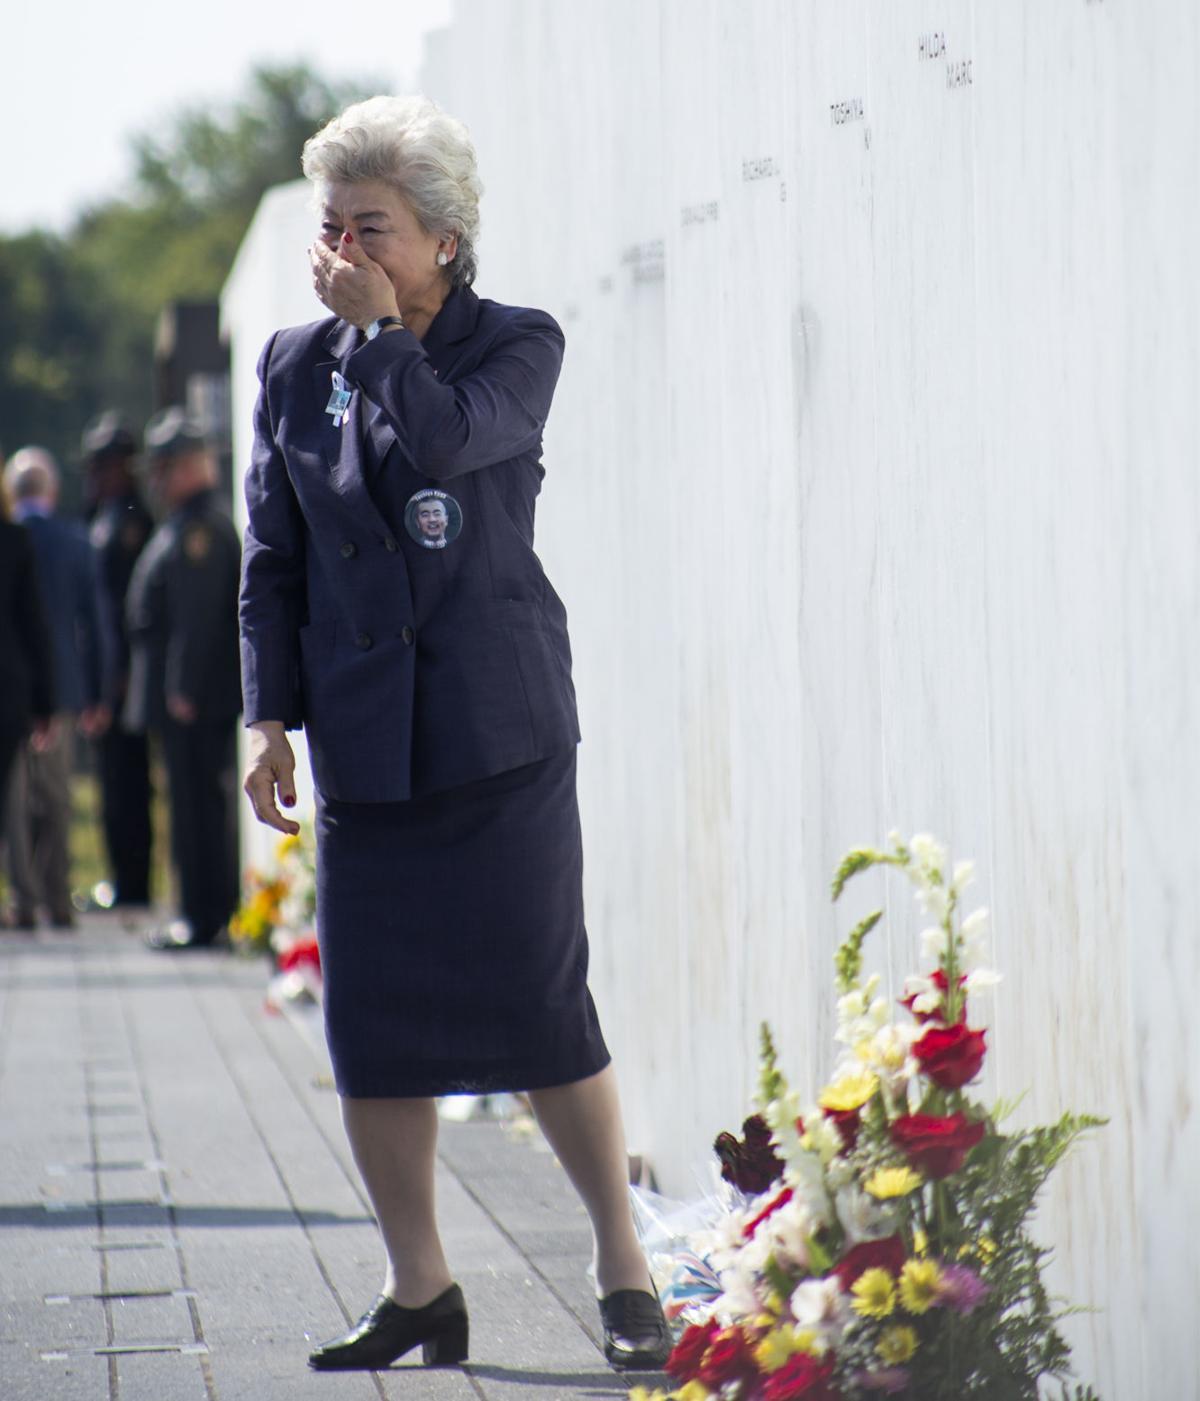 Flight 93 Memorial, Family Member Covering Mouth